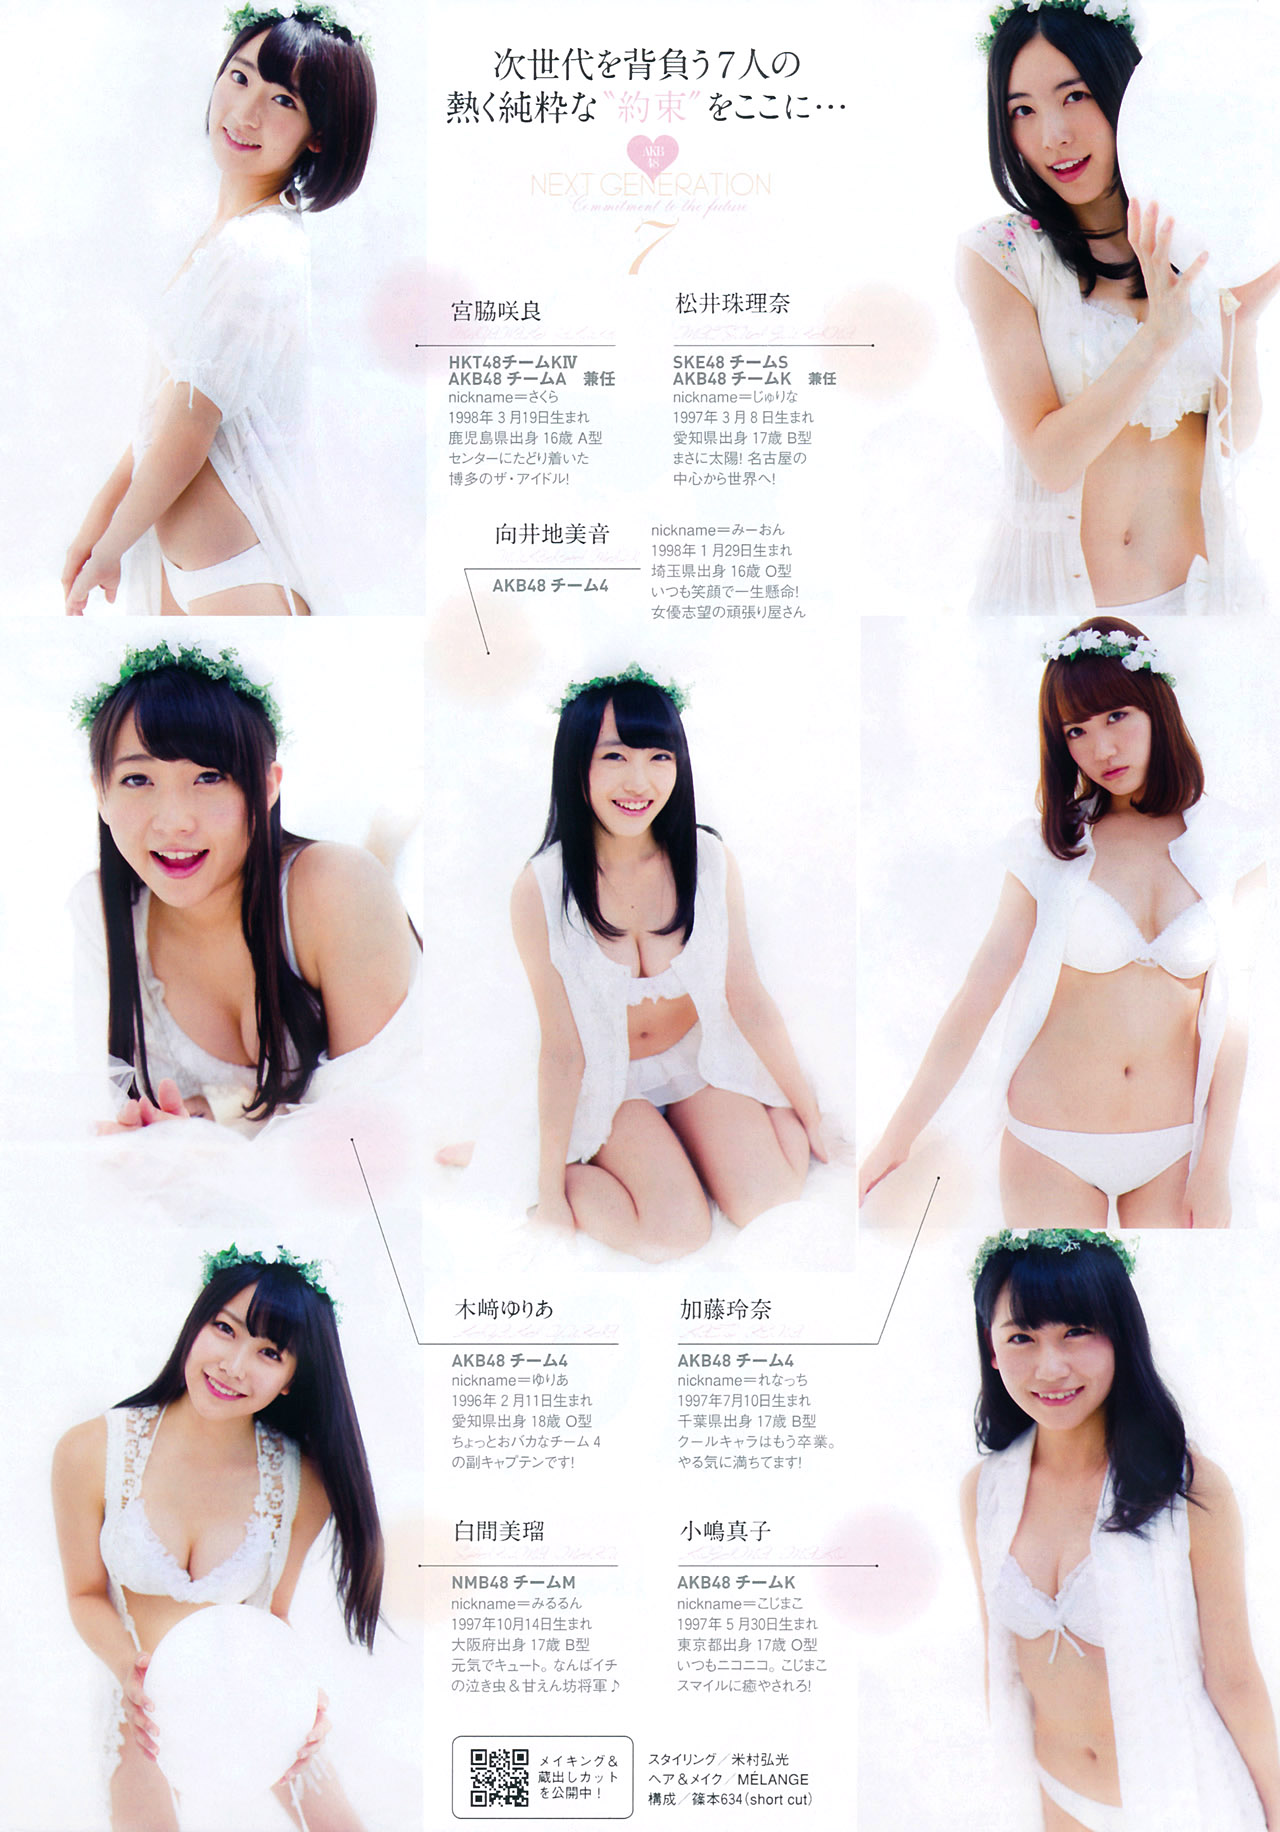 AKB48 WPB 141210 11.jpg